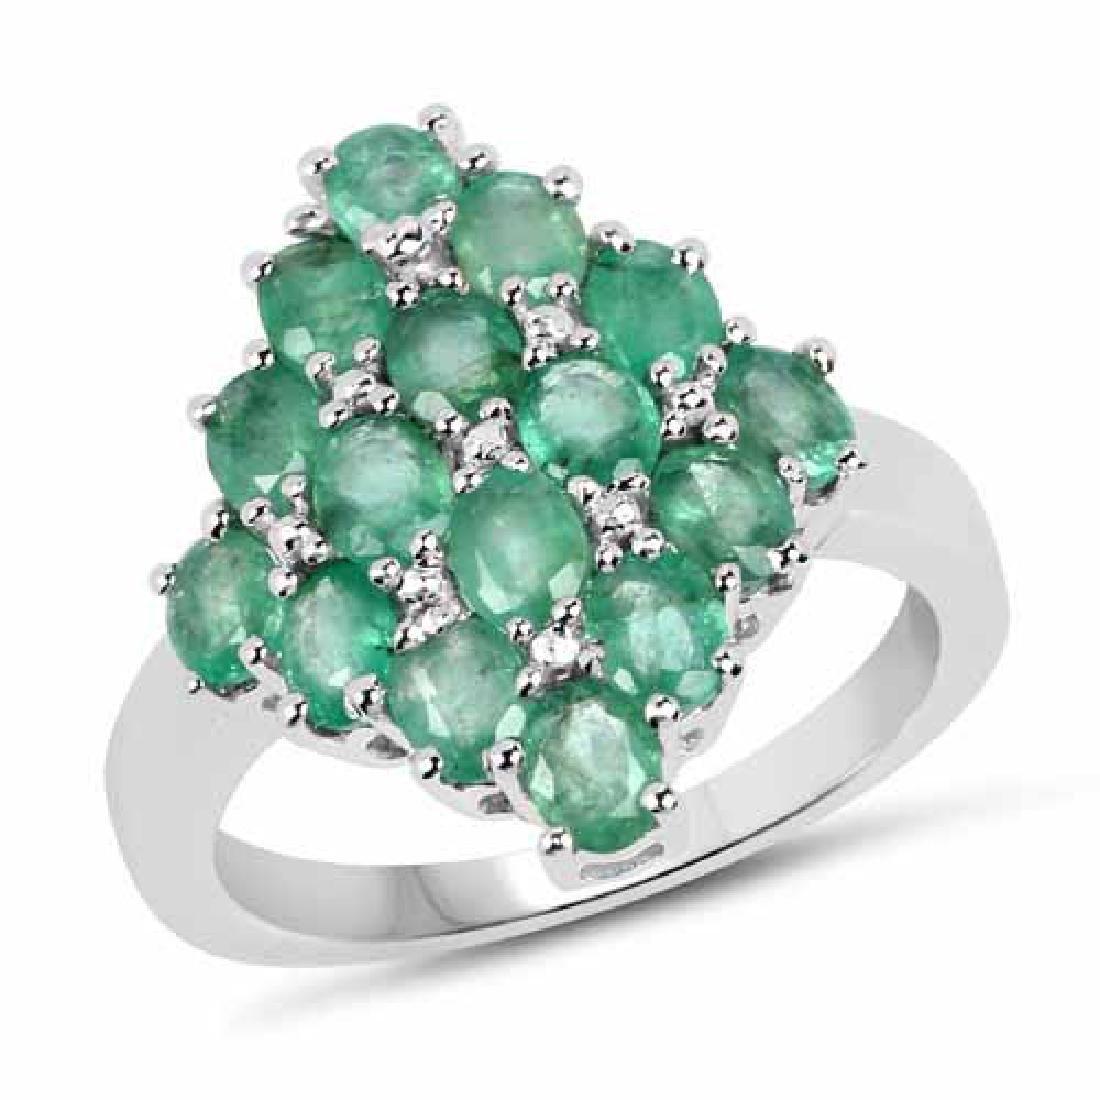 2.40 Carat Genuine Zambian Emerald .925 Sterling Silver